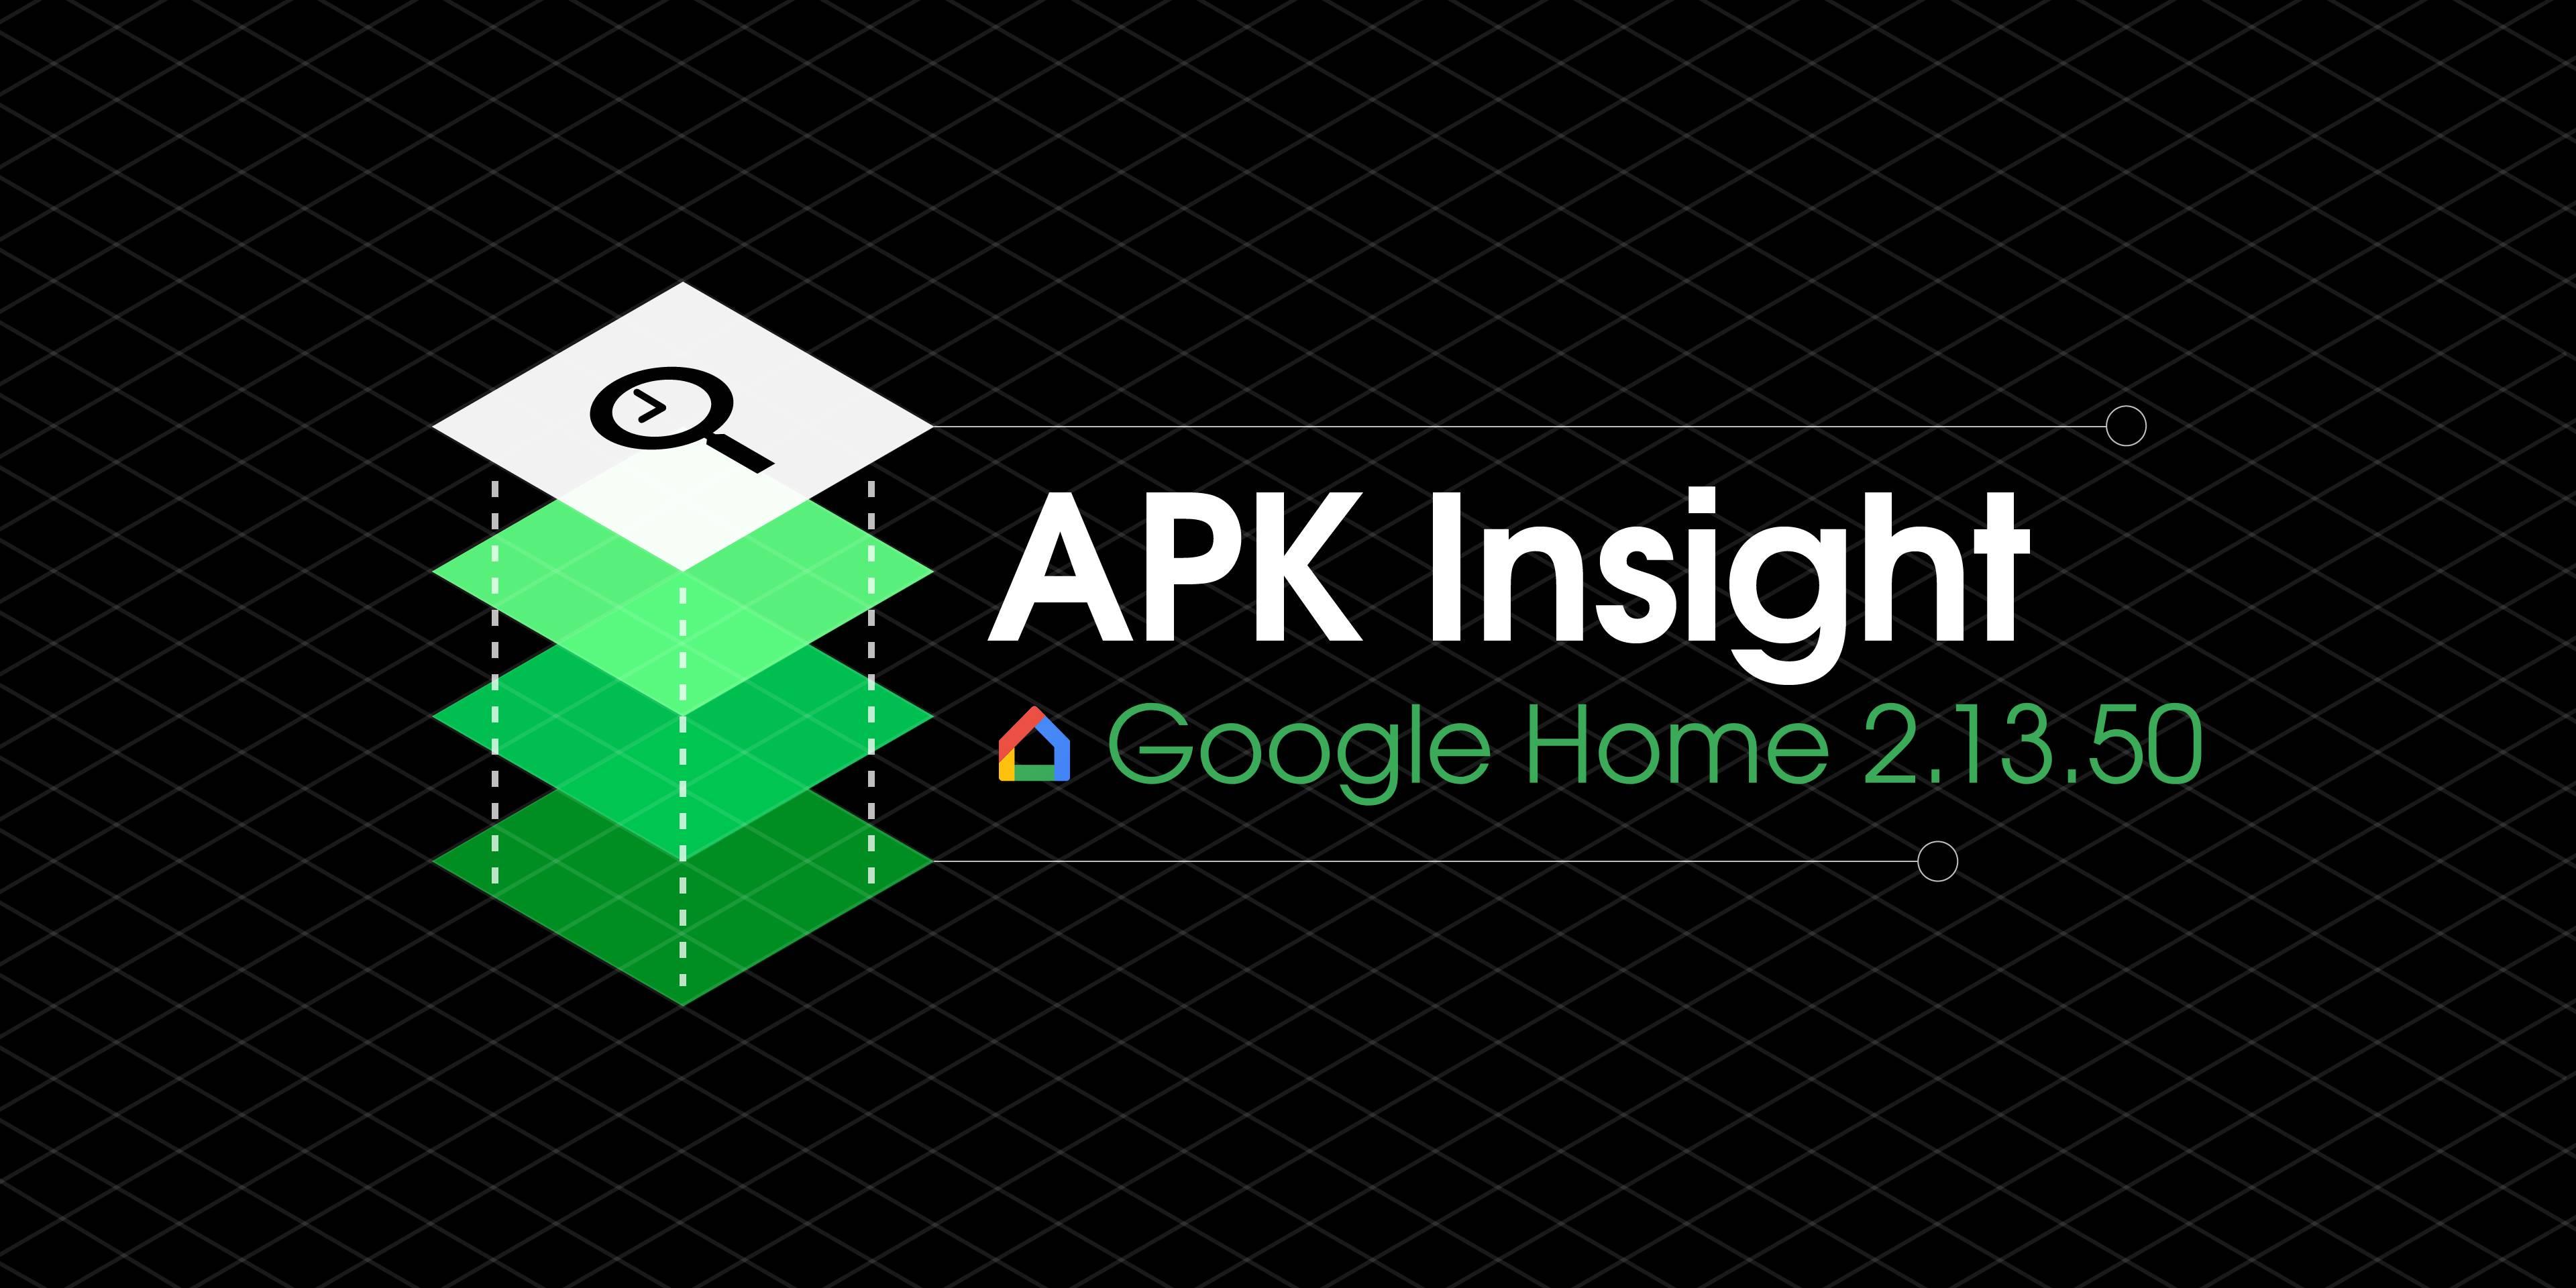 Google Home 2 13 50 preps Nest device setup, hints at new